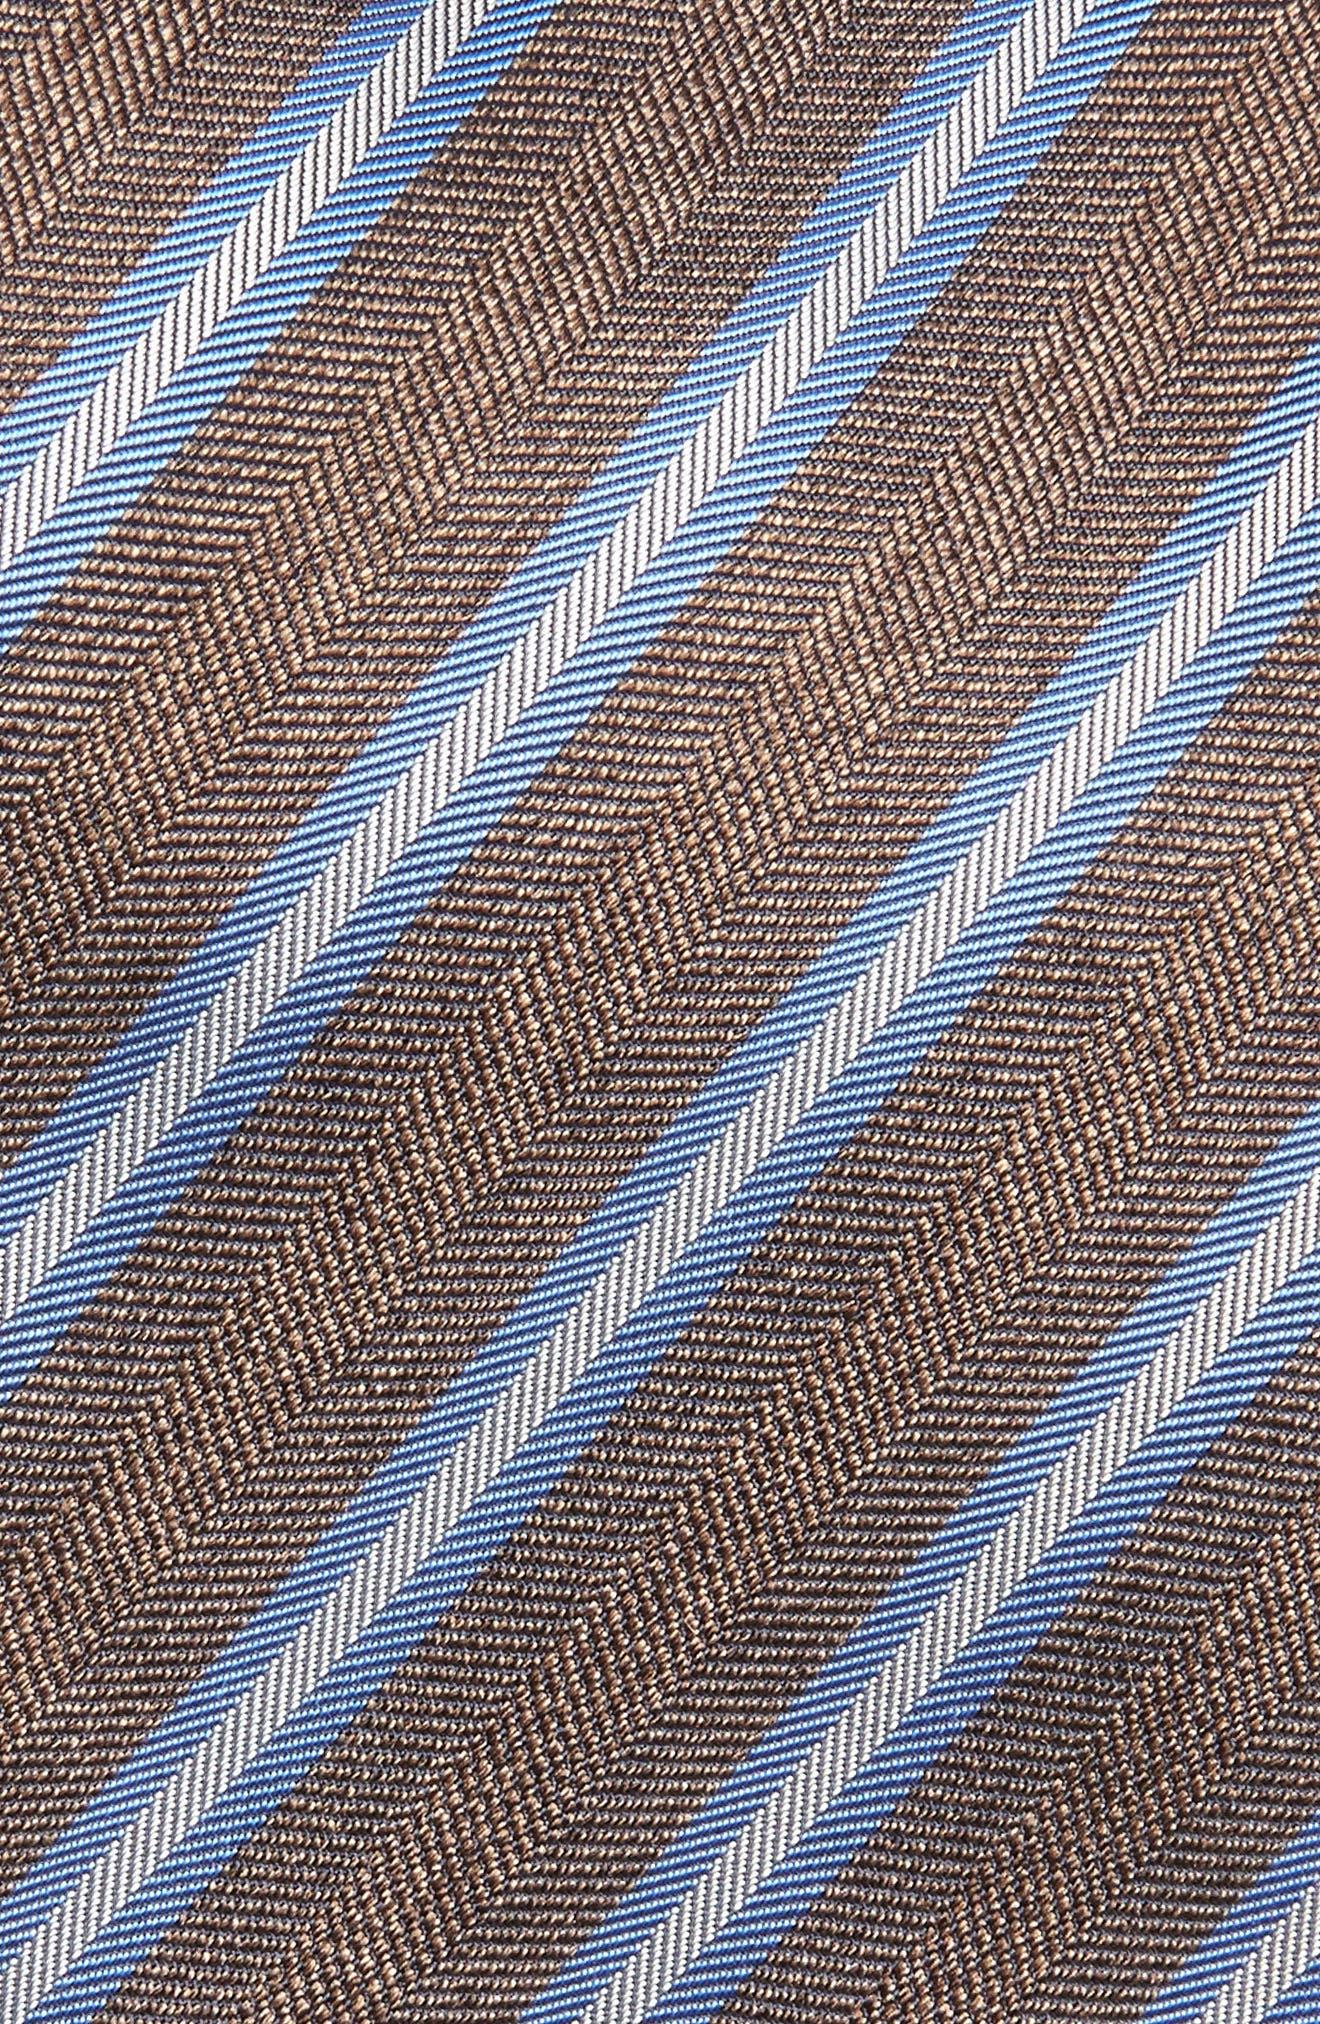 Stripe Silk & Cotton Tie,                             Alternate thumbnail 2, color,                             CHOCOLATE